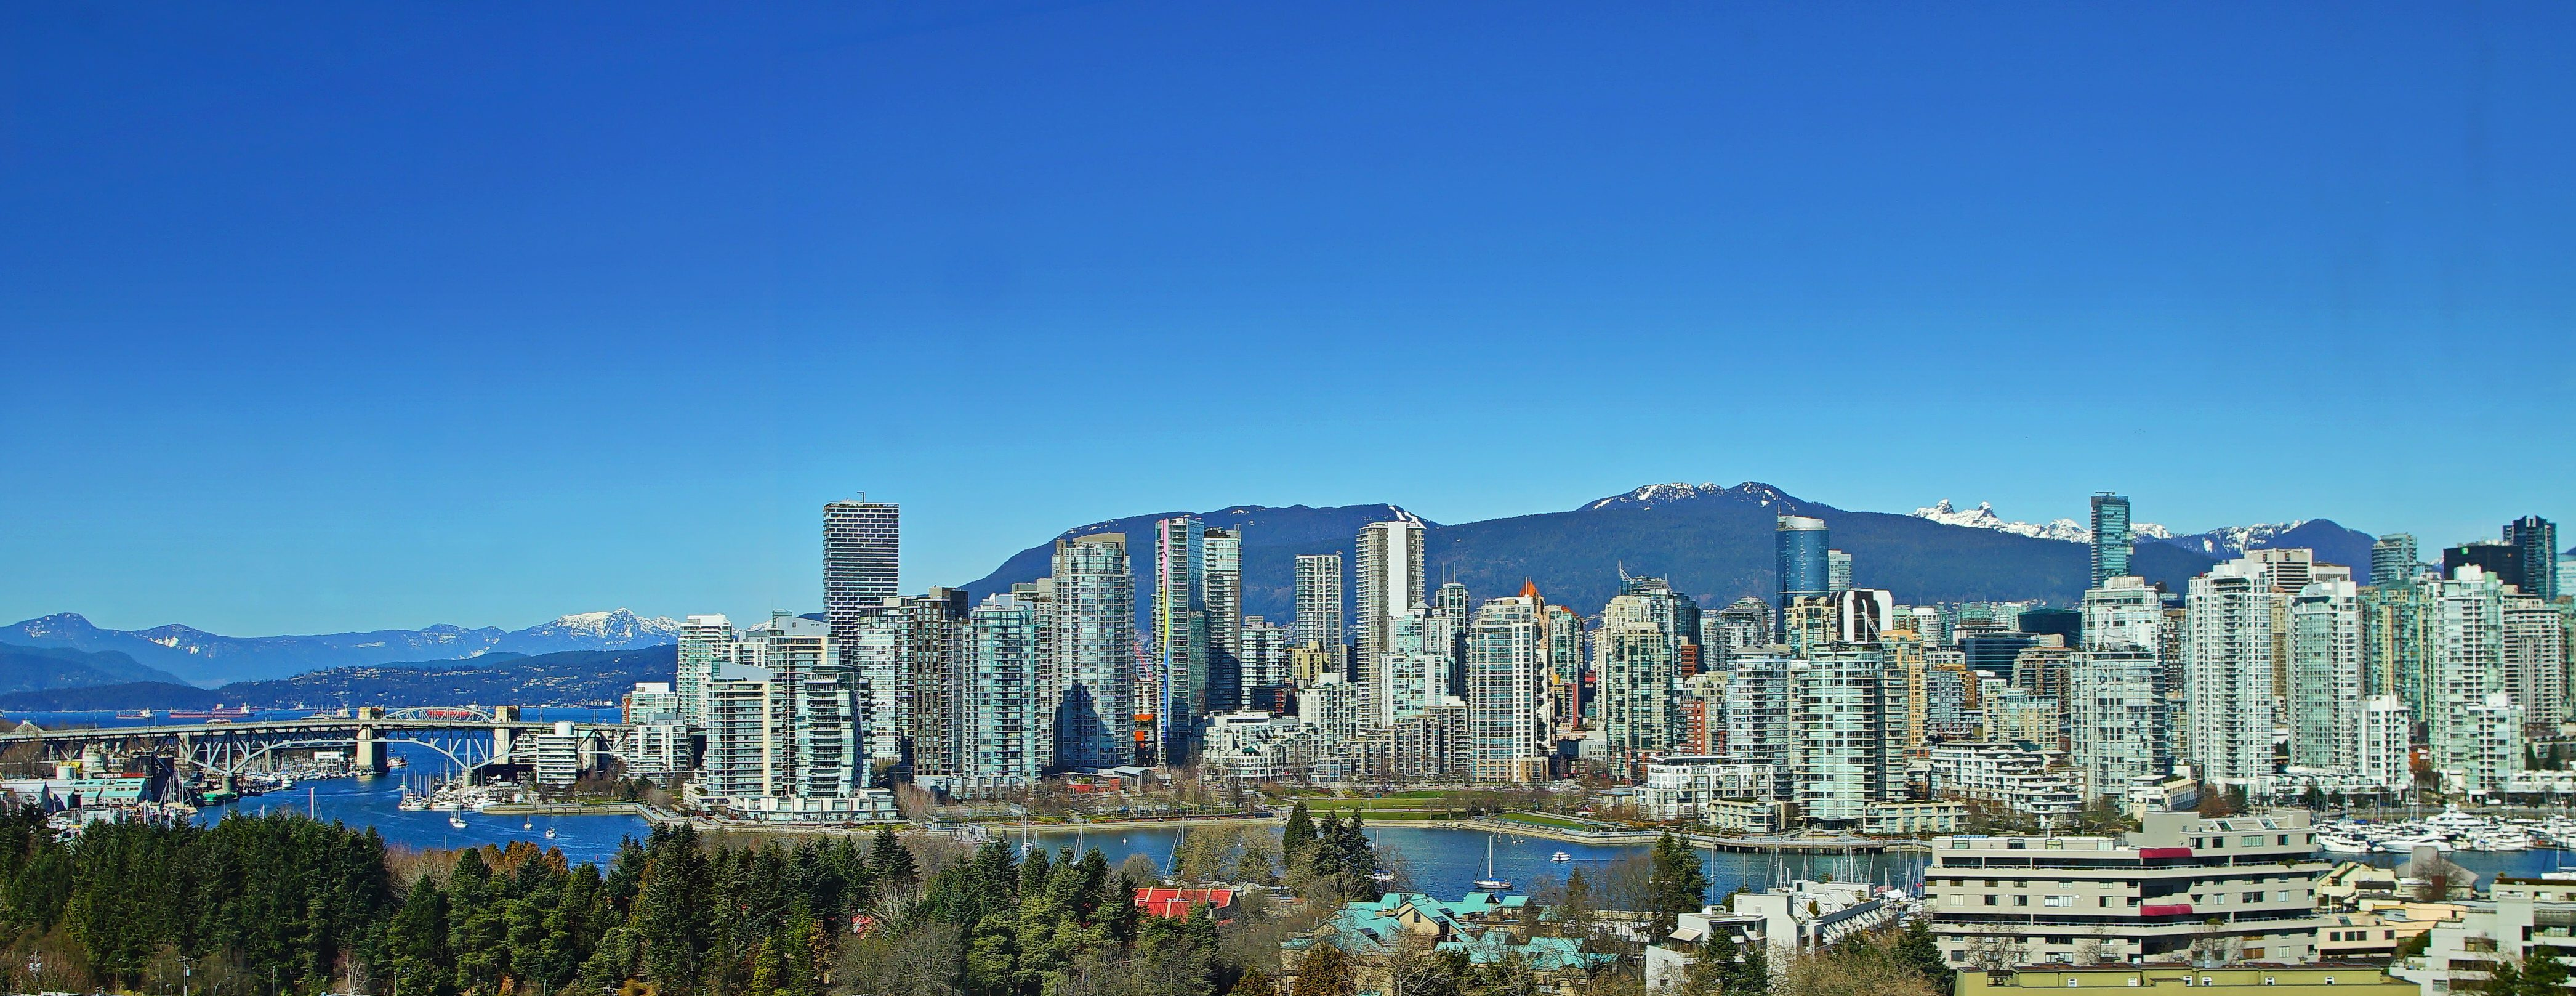 Landscape view of Vancouver city skyline